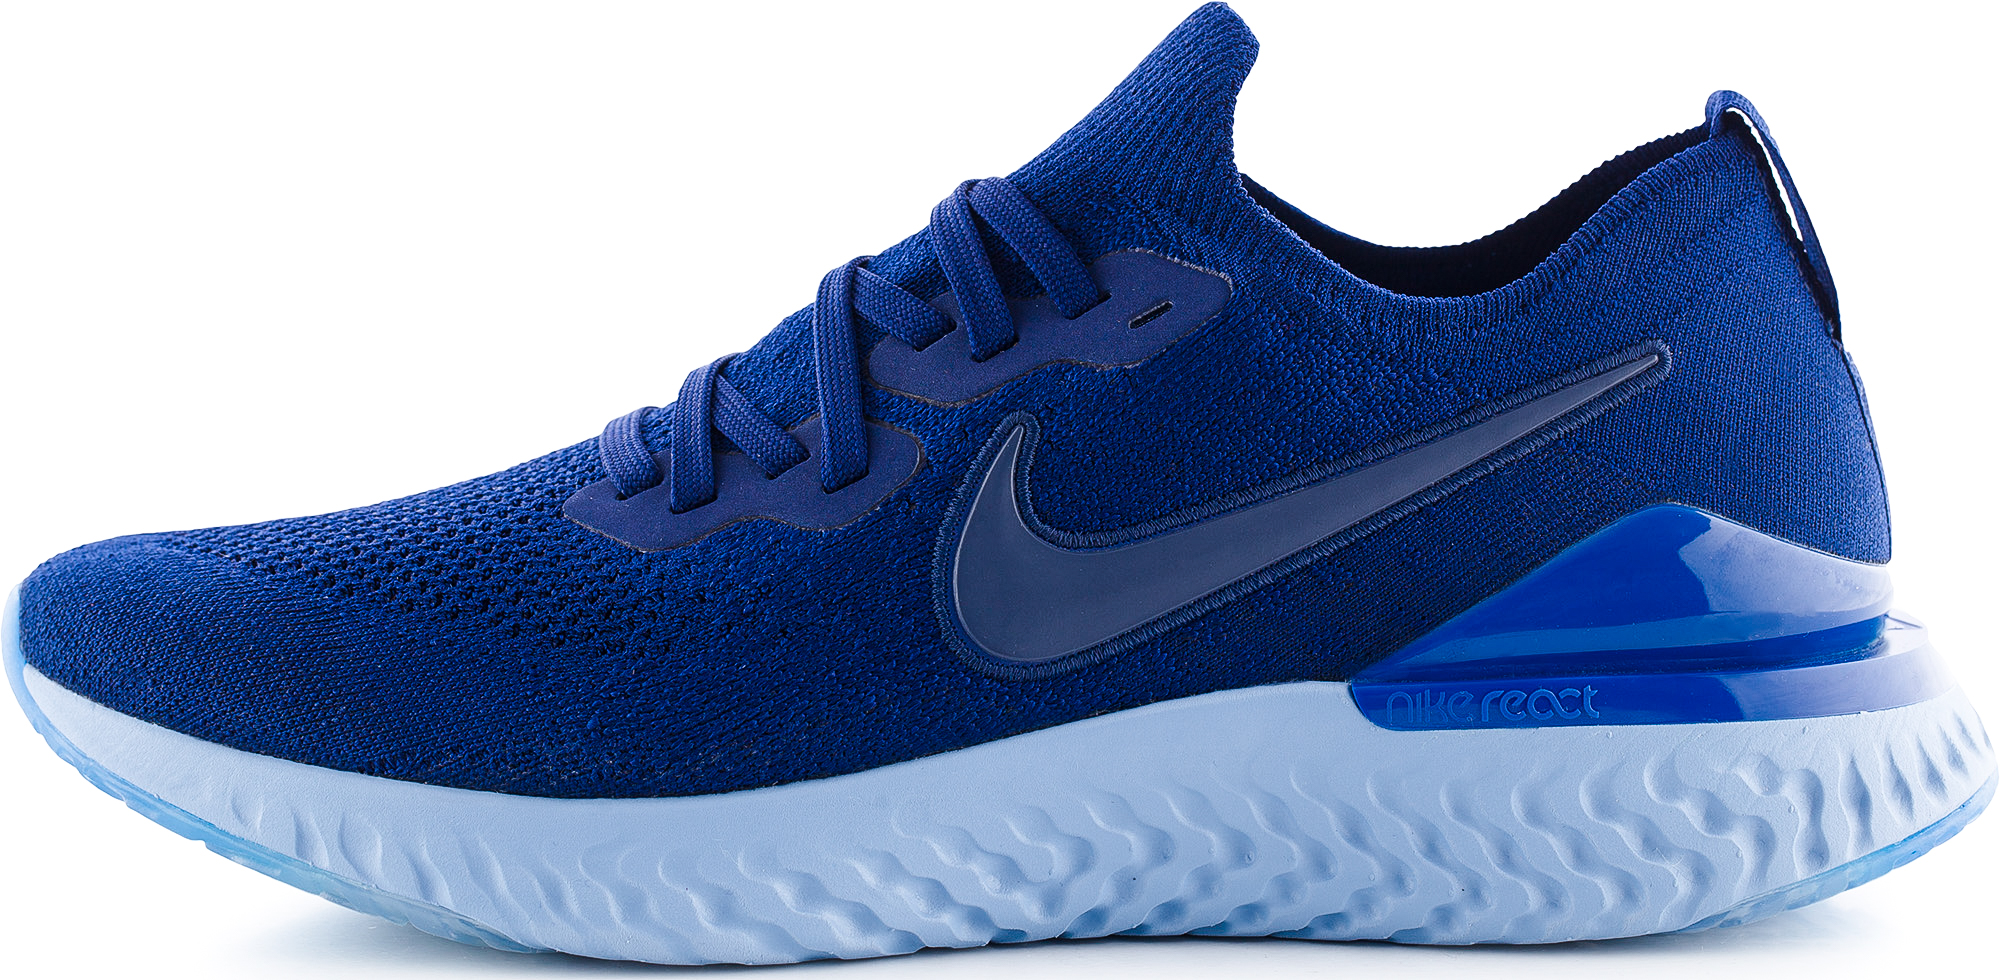 Nike Кроссовки мужские Nike Epic React Flyknit 2, размер 44